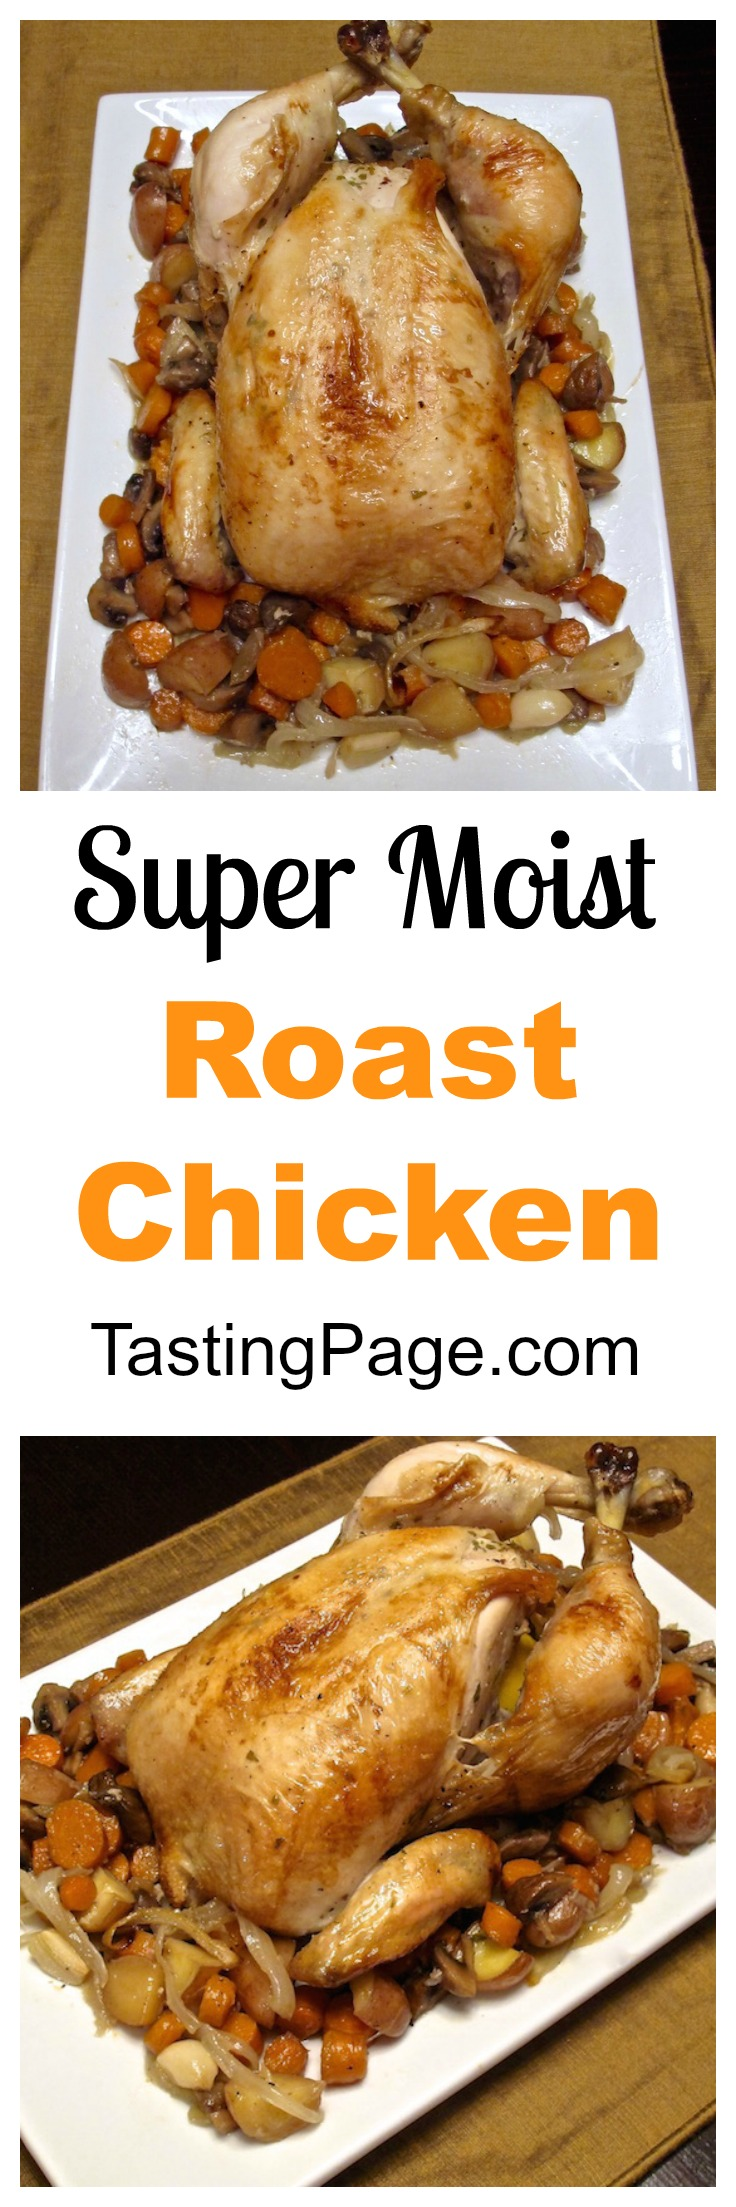 how to cook a moist roast chicken